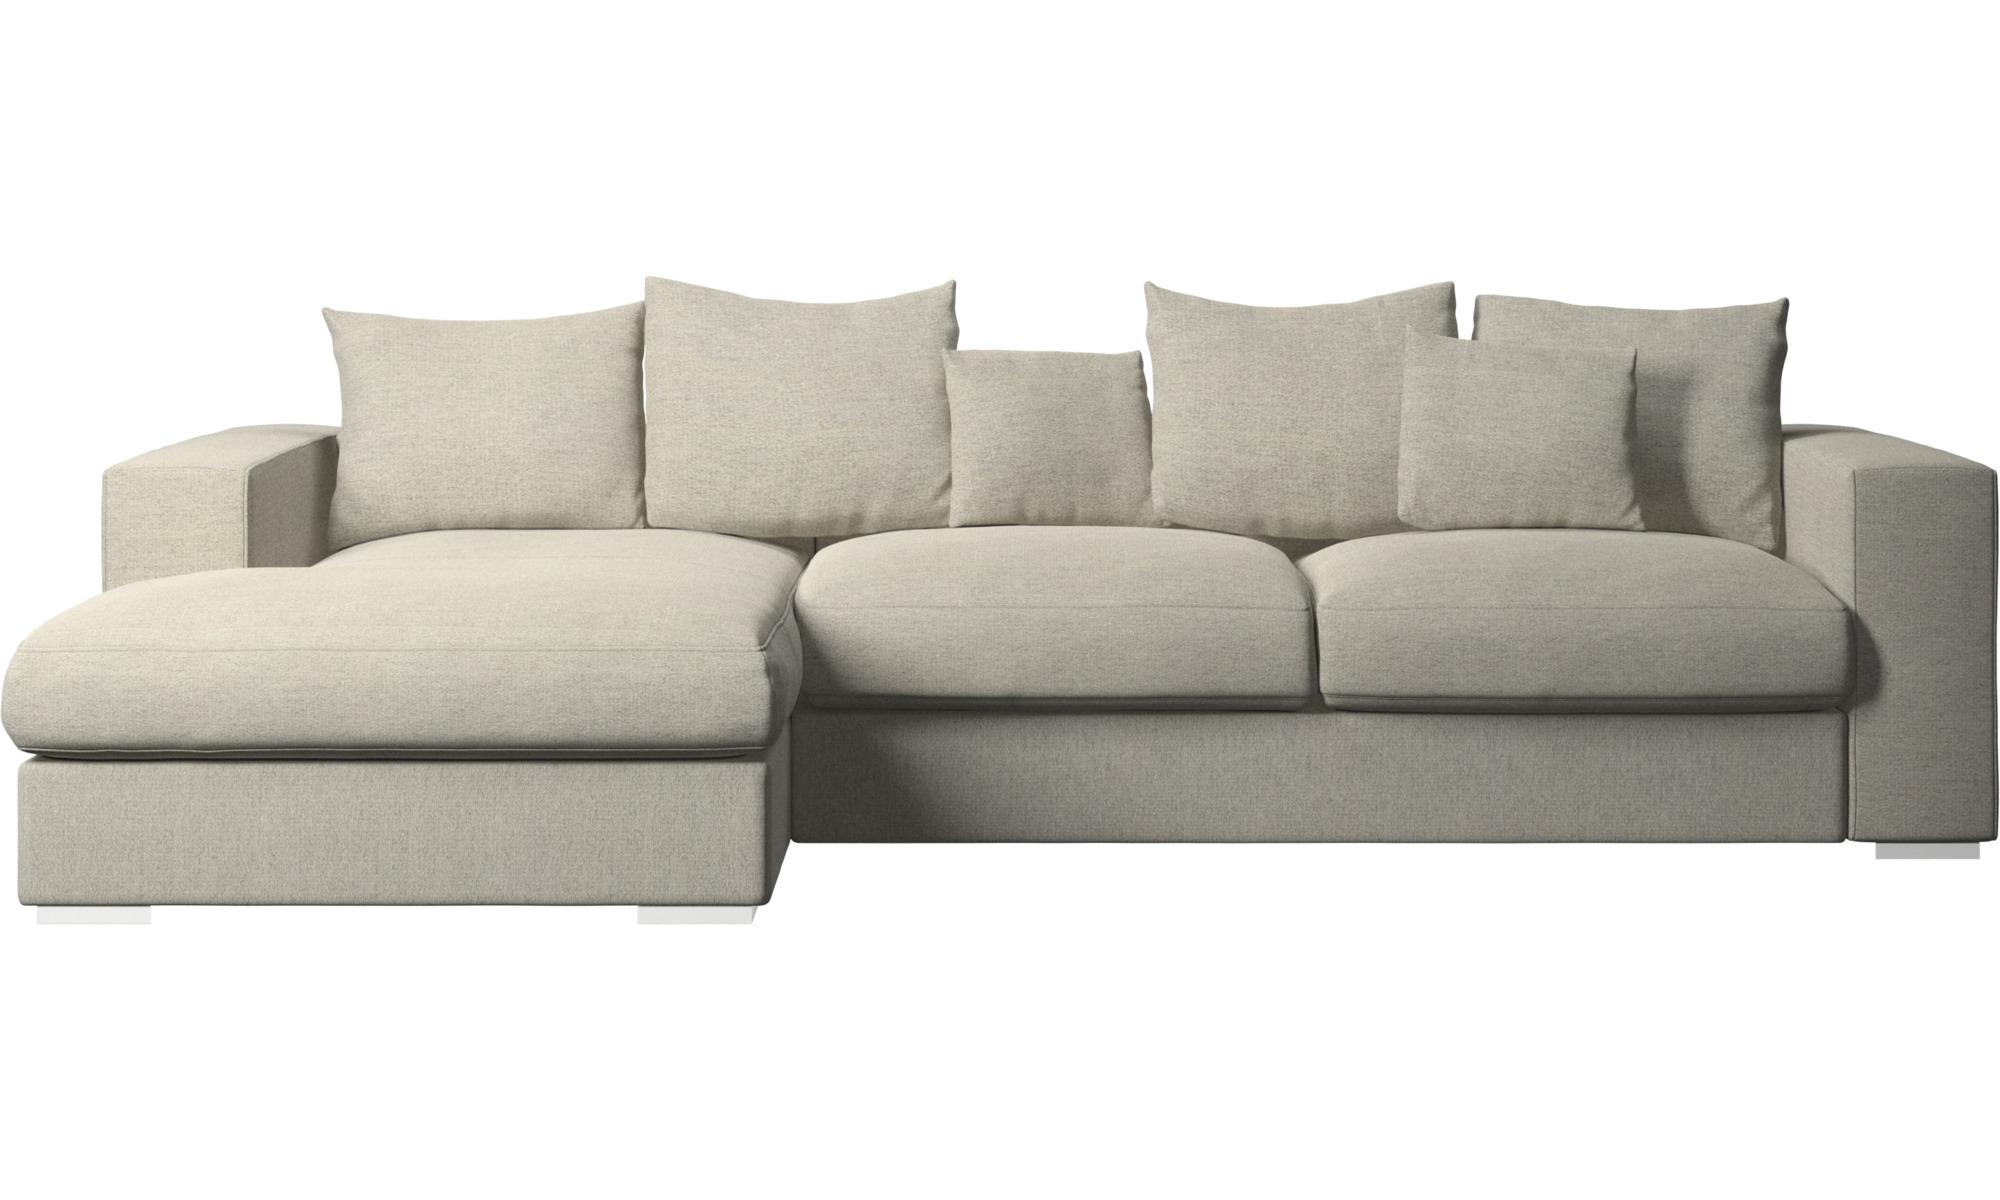 Chaise longue sofas - Cenova sofa with resting unit - Beige - Fabric